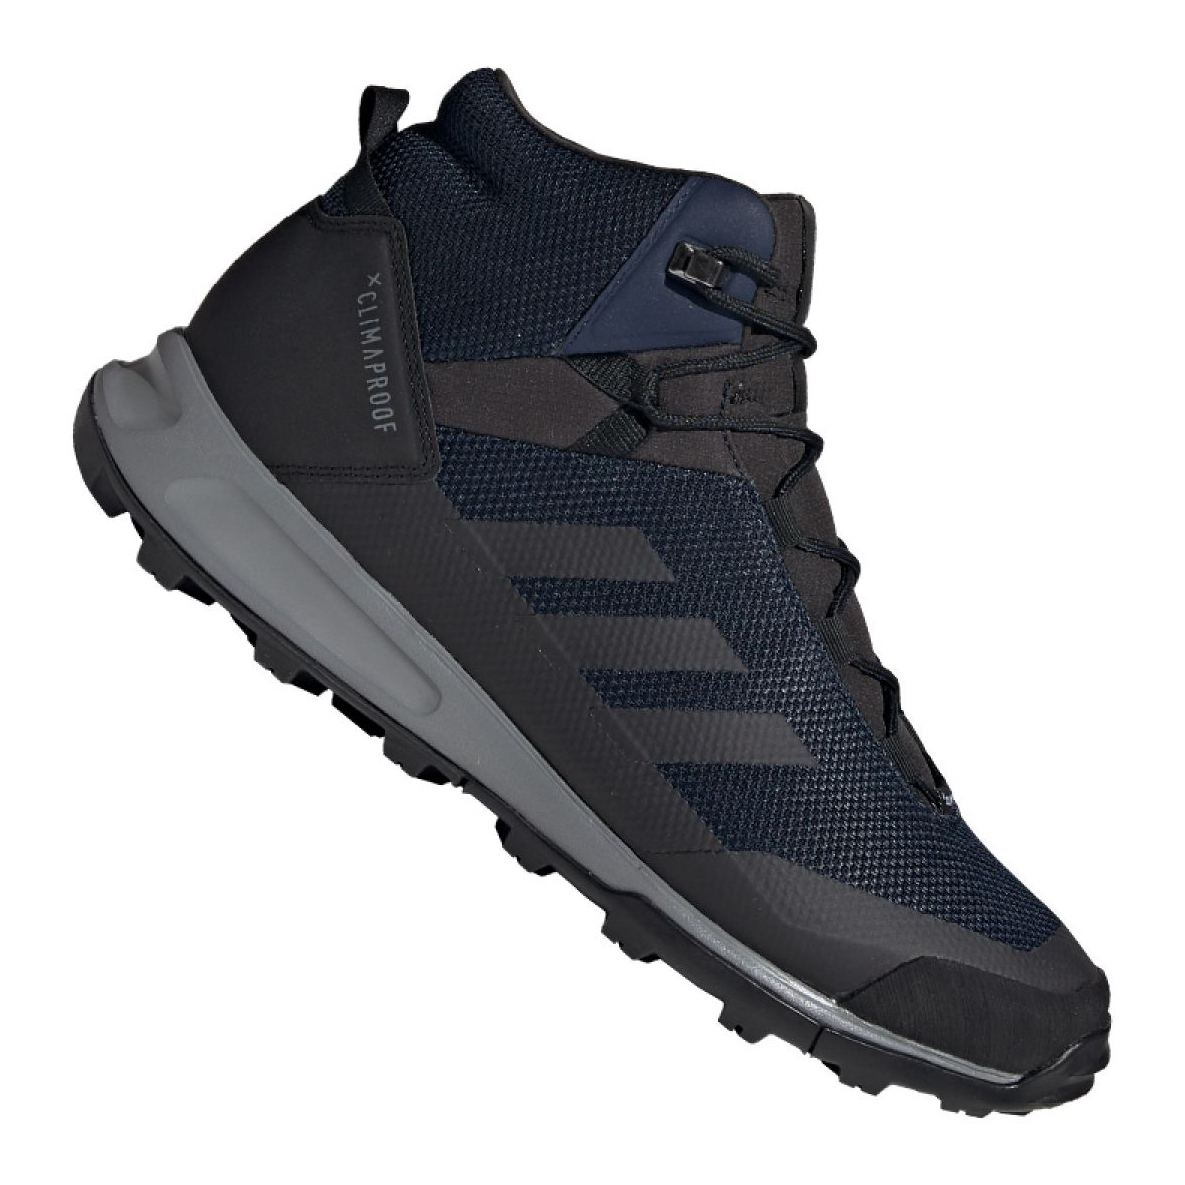 Adidas Terrex Tivid Mid Cp M G26518 shoes black navy